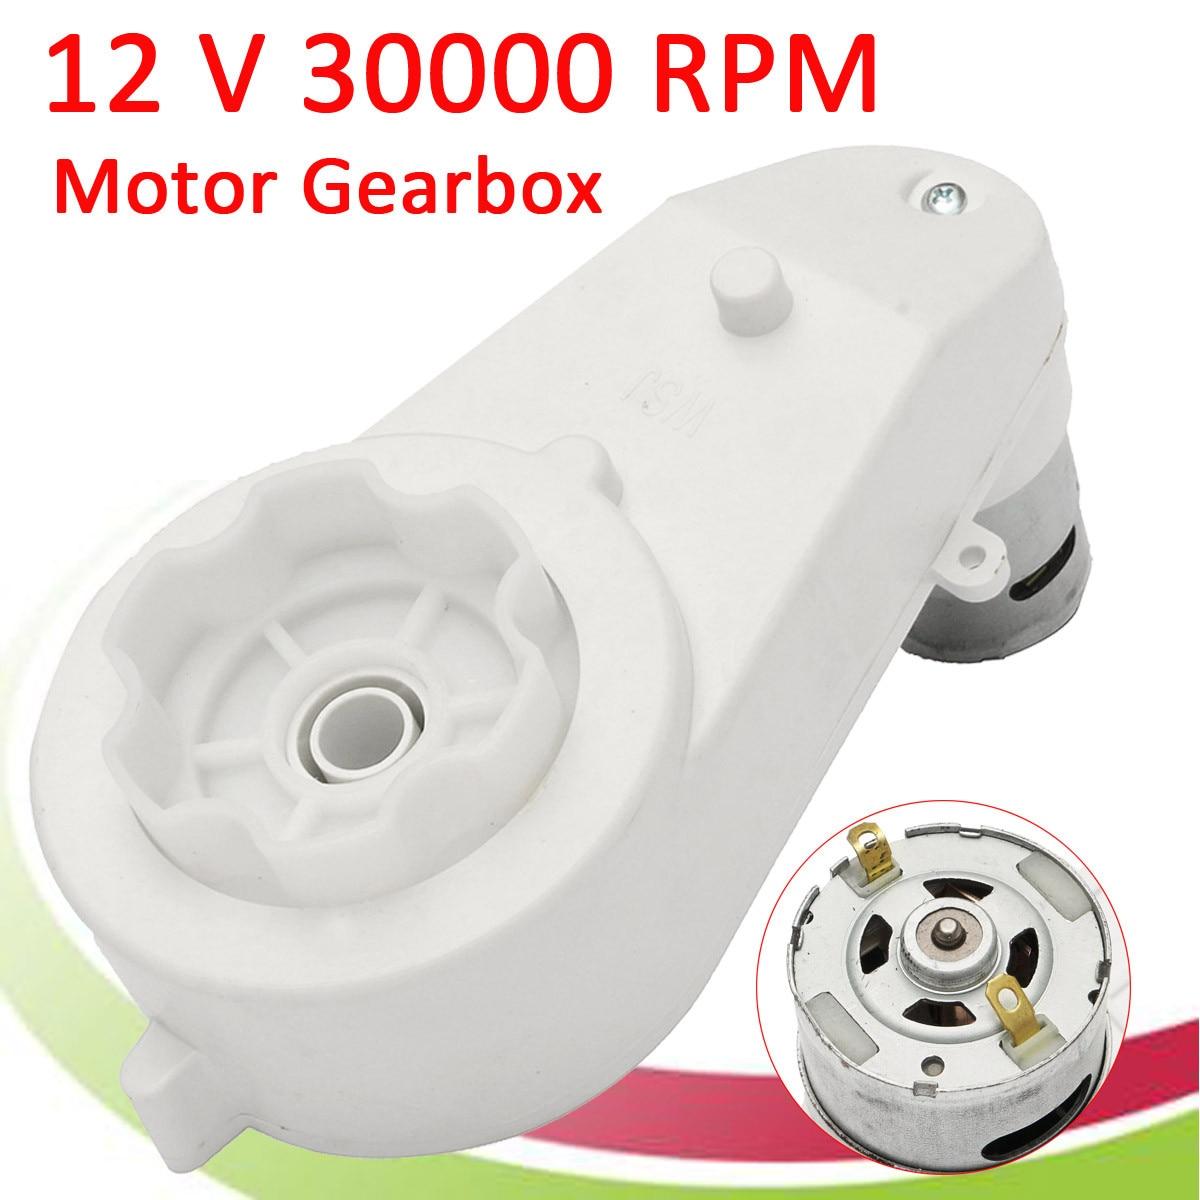 1 Pcs 12 V 3000 rpm 6.3 centimetri 0.47